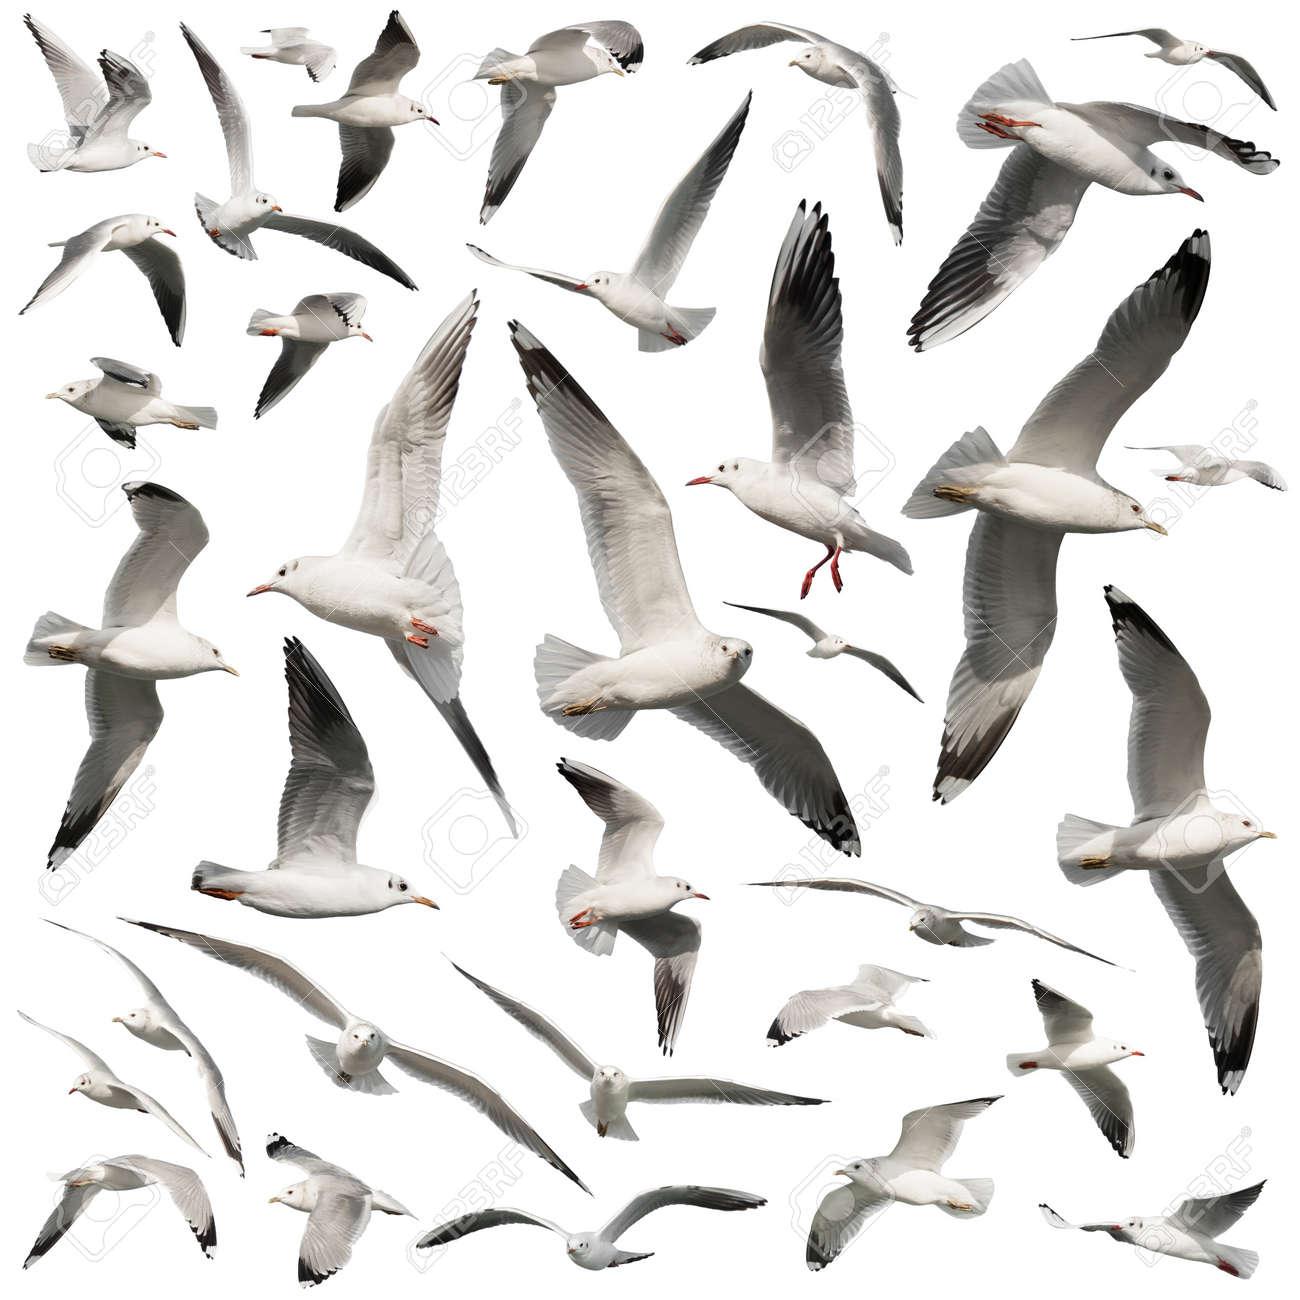 Seagull birds set isolated on white - 19198153